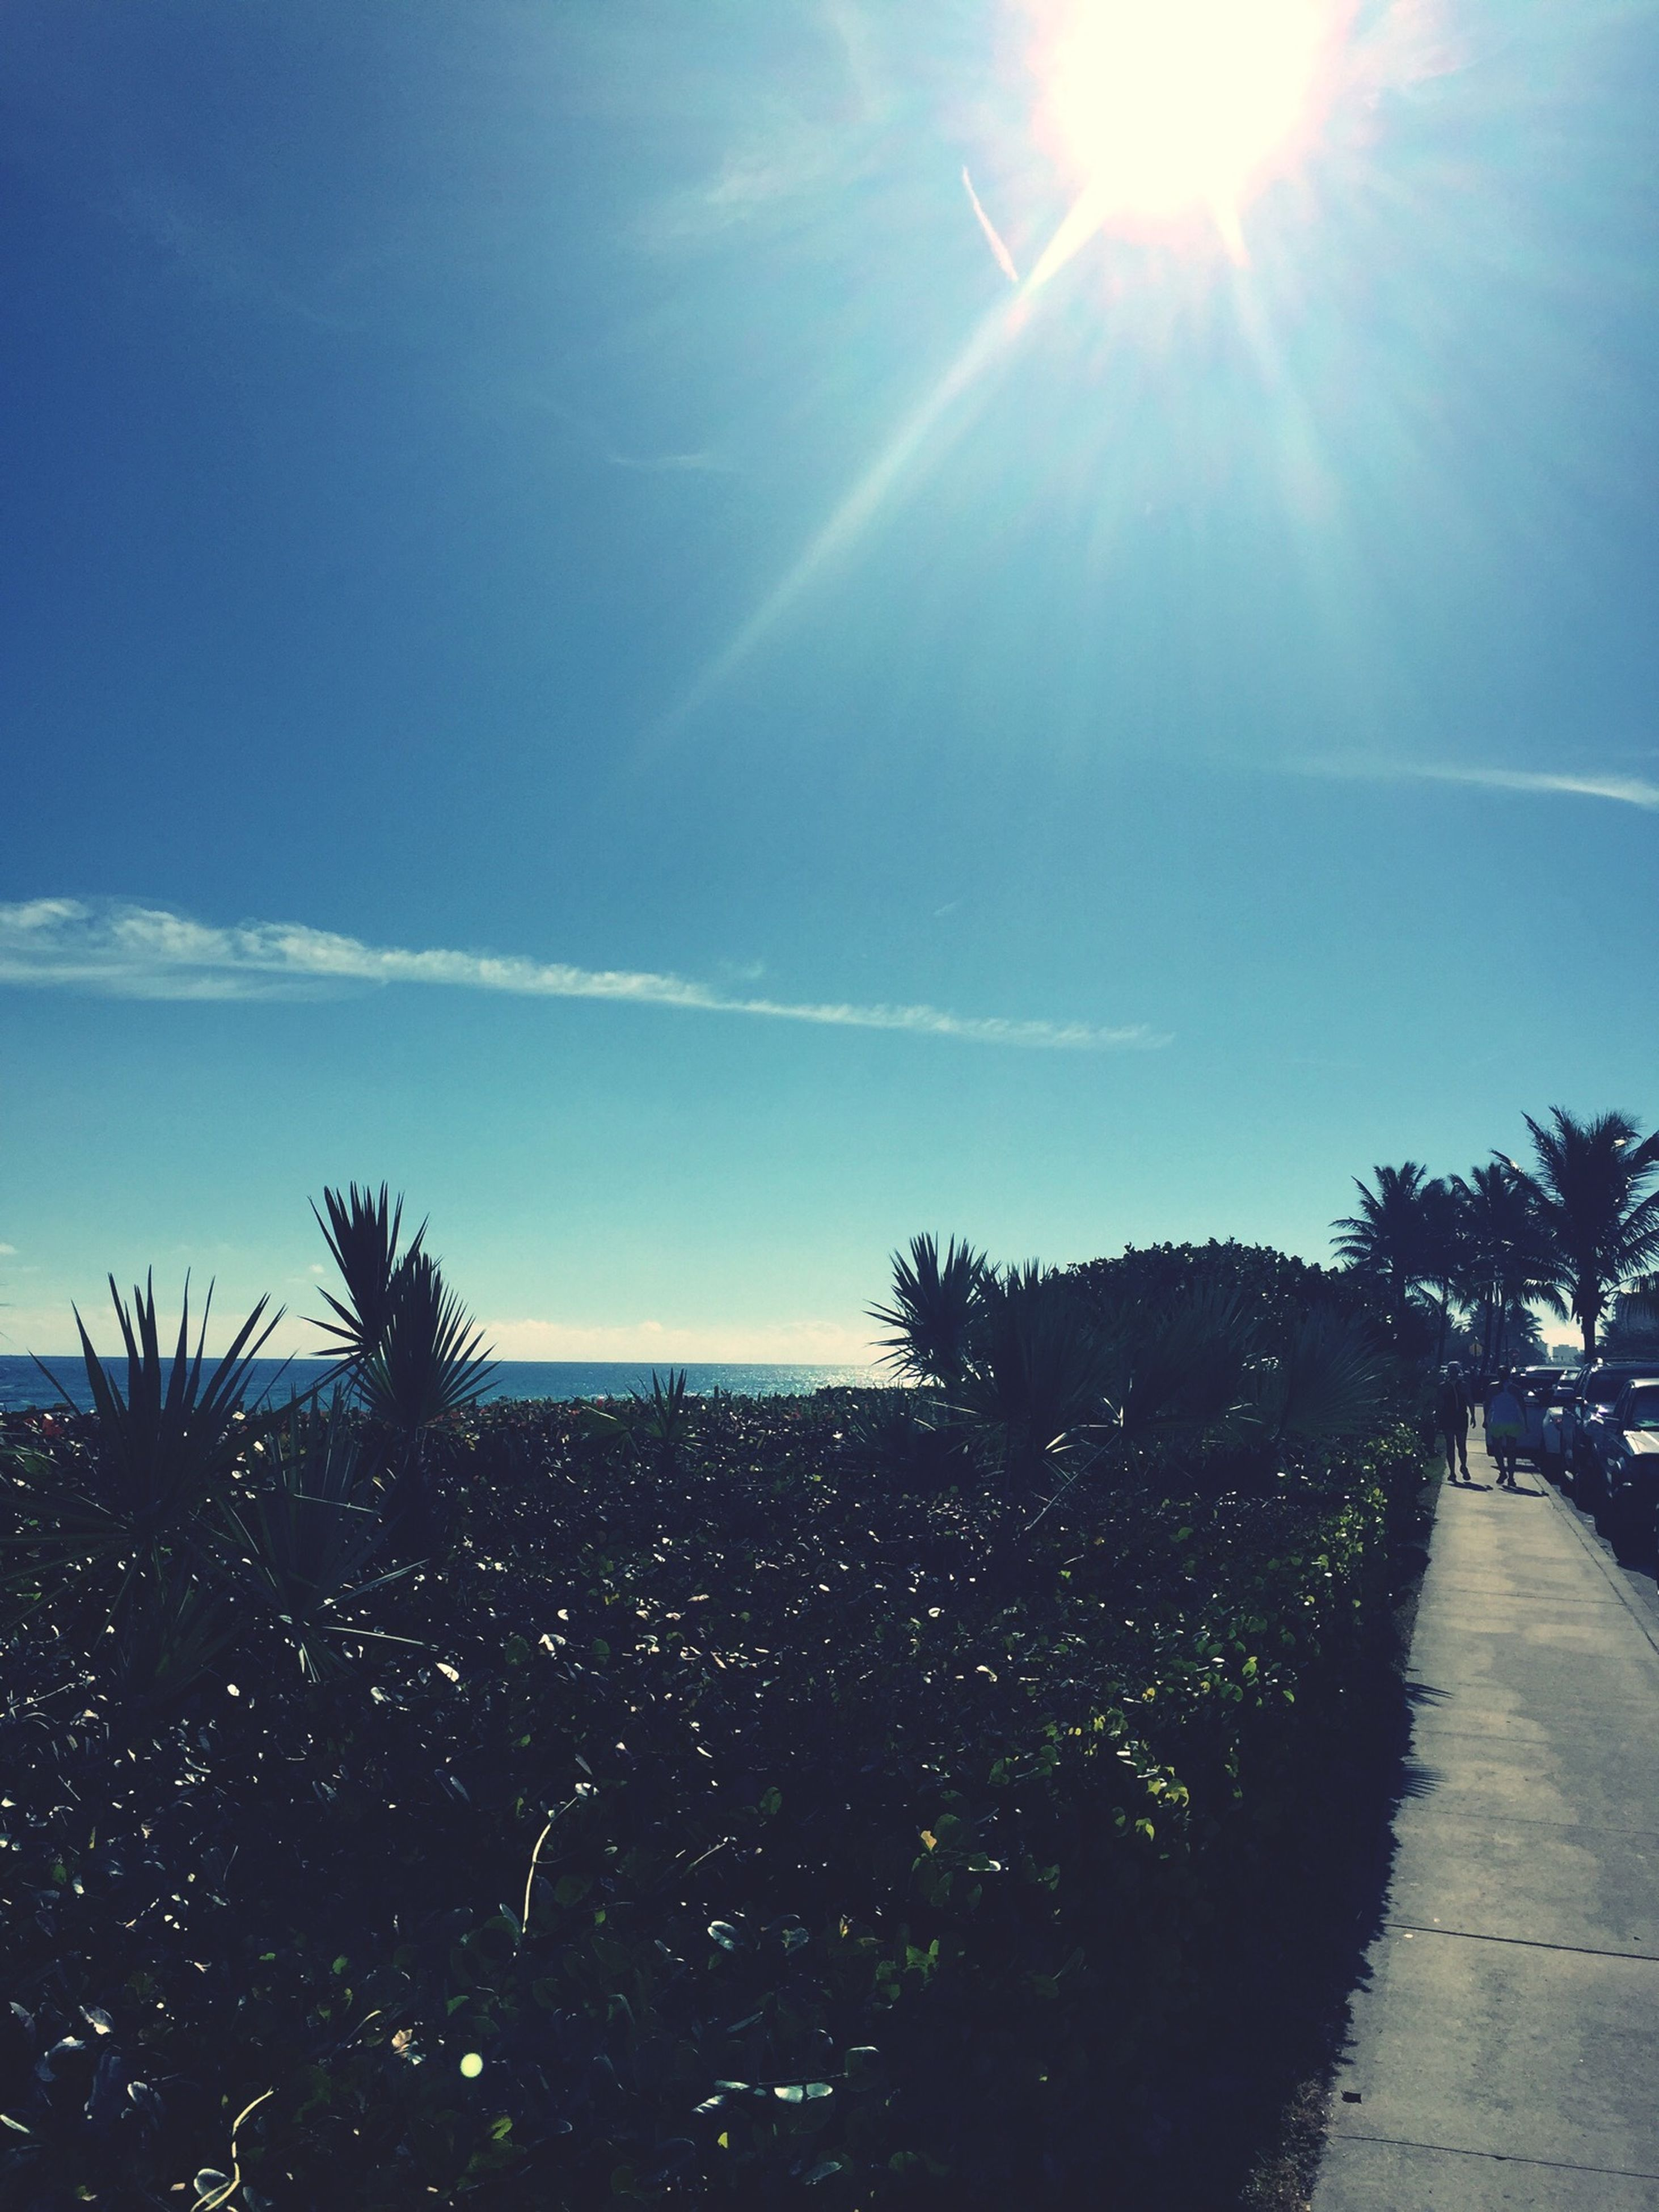 sun, sunlight, sunbeam, sea, horizon over water, sky, water, tranquil scene, blue, tranquility, lens flare, scenics, beauty in nature, sunny, beach, nature, tree, palm tree, bright, idyllic